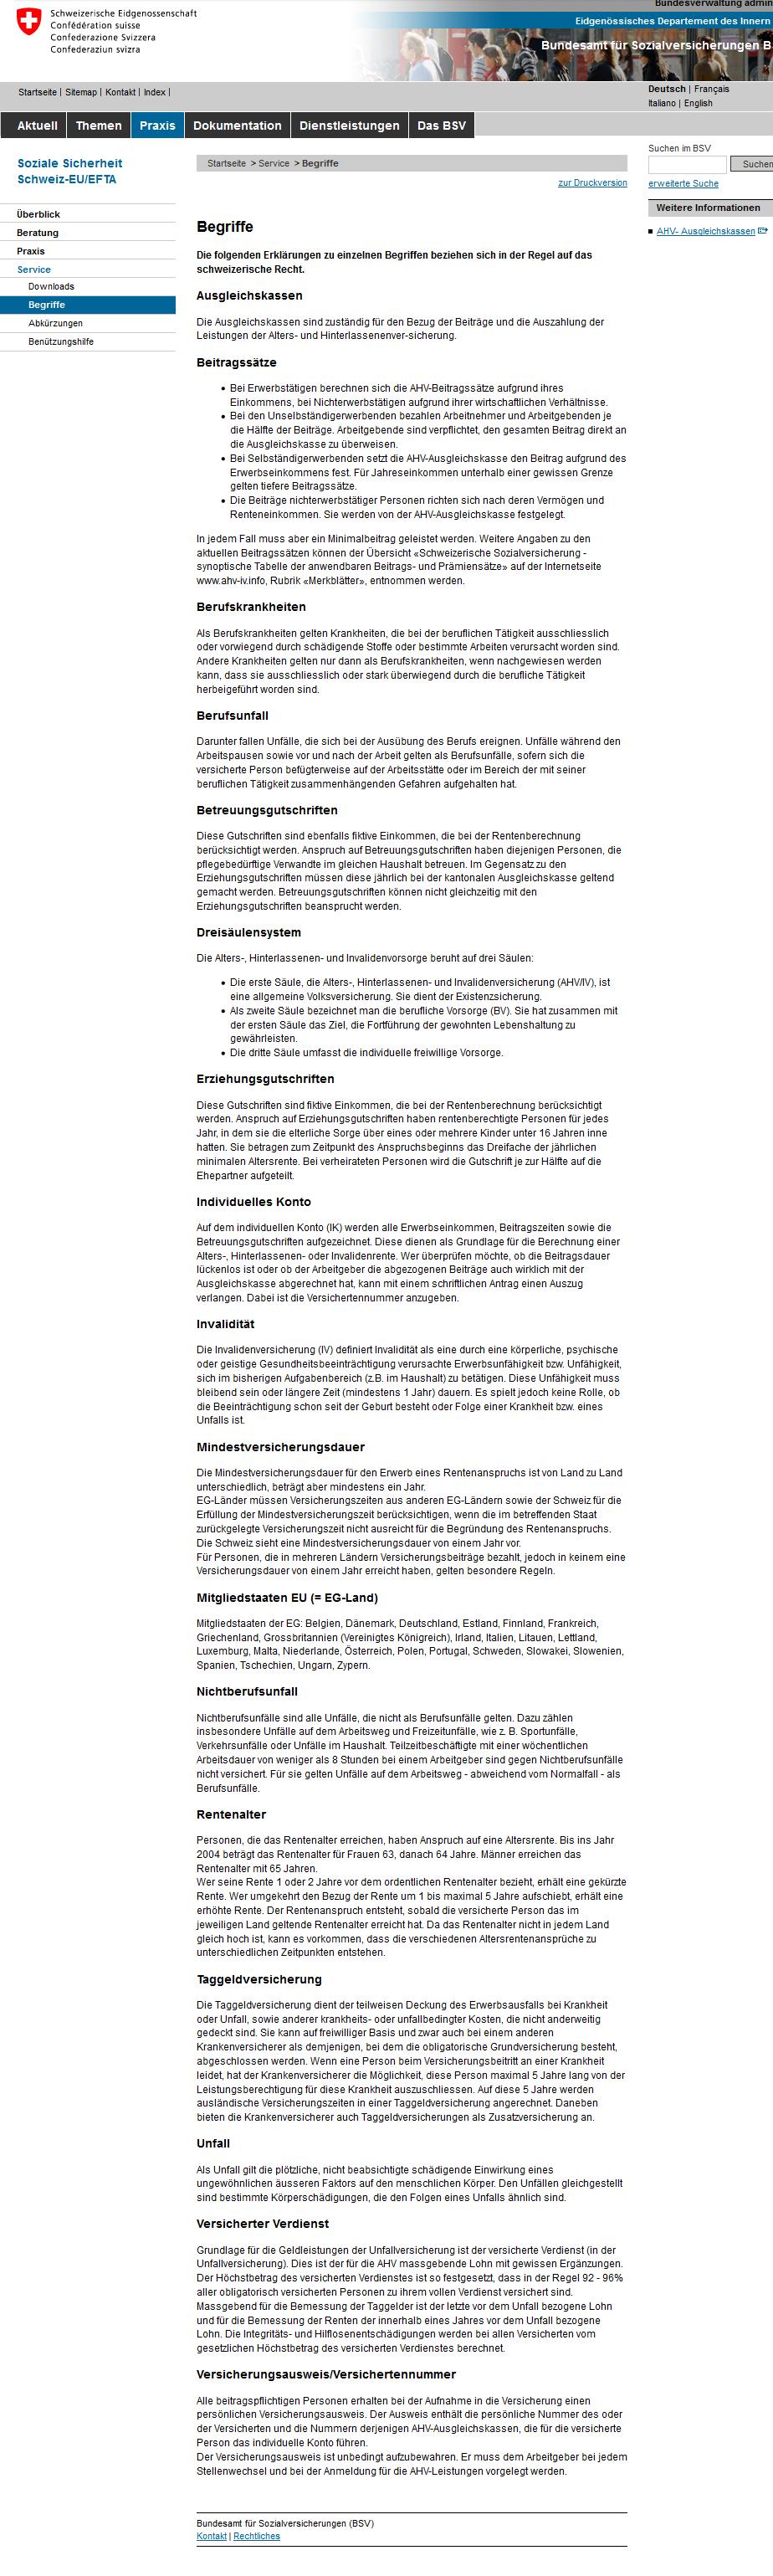 FireShot Screen Capture #053 - 'BSV - Begriffe' - web_archive_org_web_20080629064039_www_bsv_admin_ch_soziale_sicherheit_service_00652_index_html